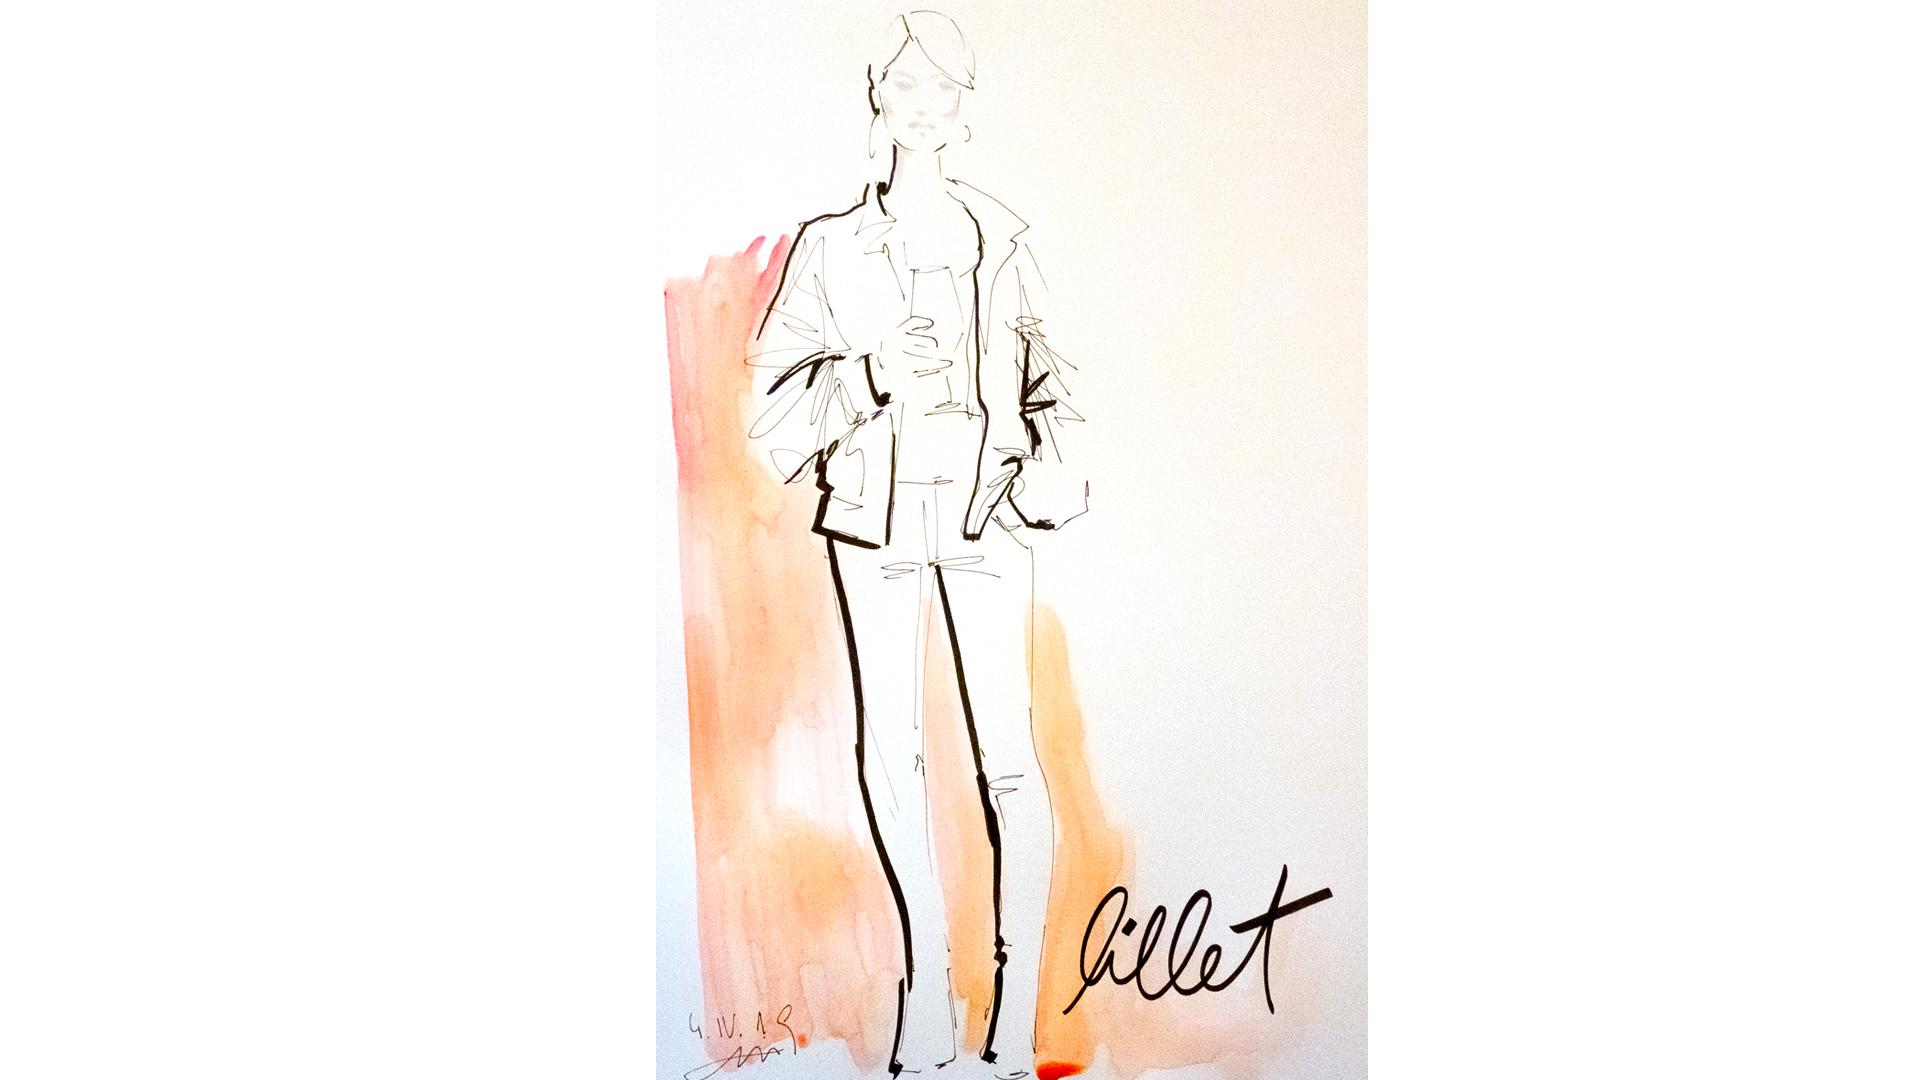 Live-Sketching-Fashion-Illustration-Event-Lillet-Virginia-Romo-4.jpg